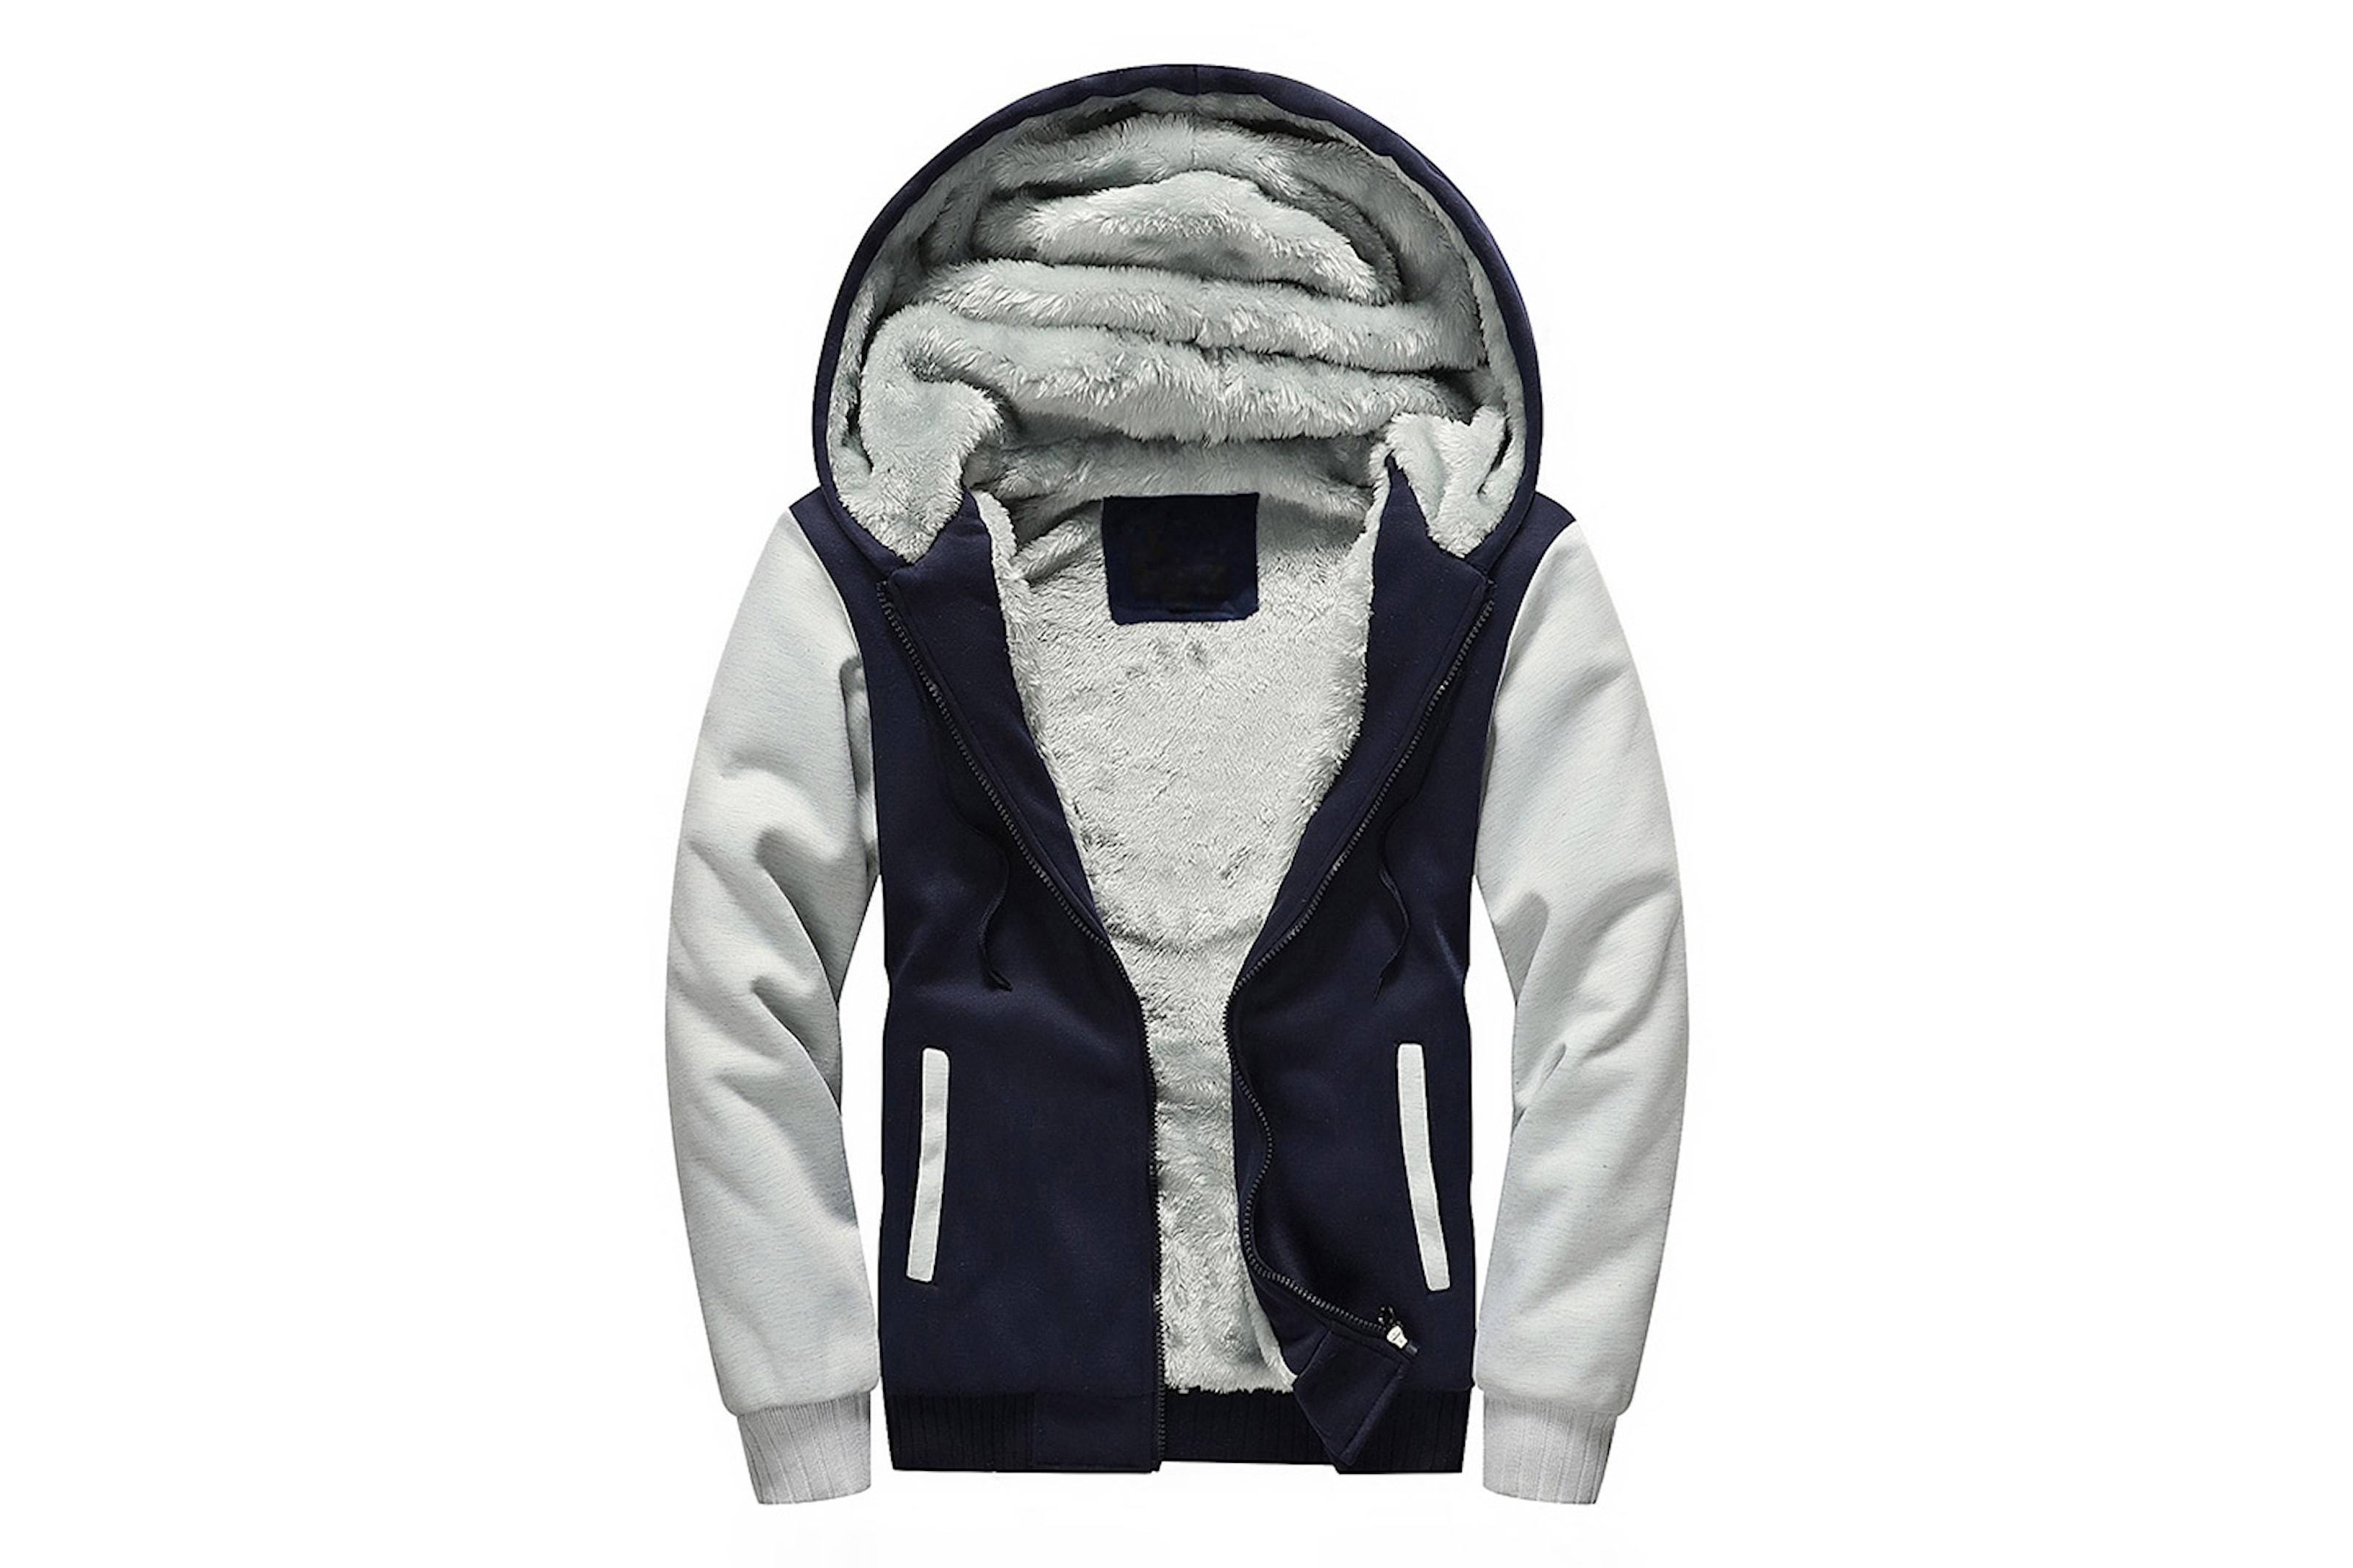 Varm och mjuk hoodie